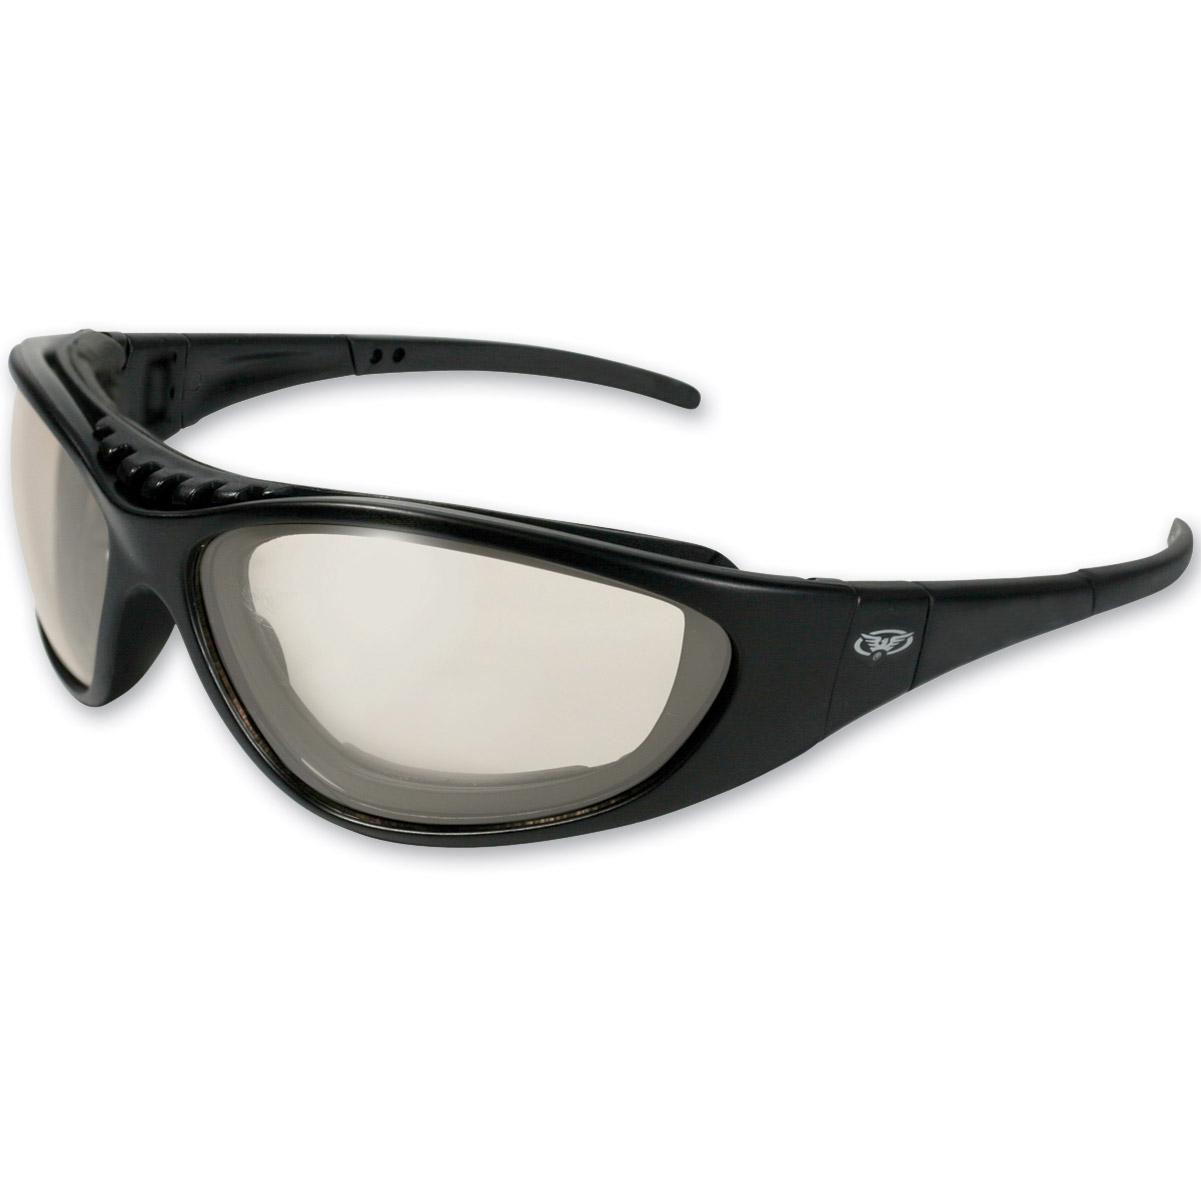 Global Vision Eyewear Freedom 24 Photochromic Sunglasses with Clear Lens